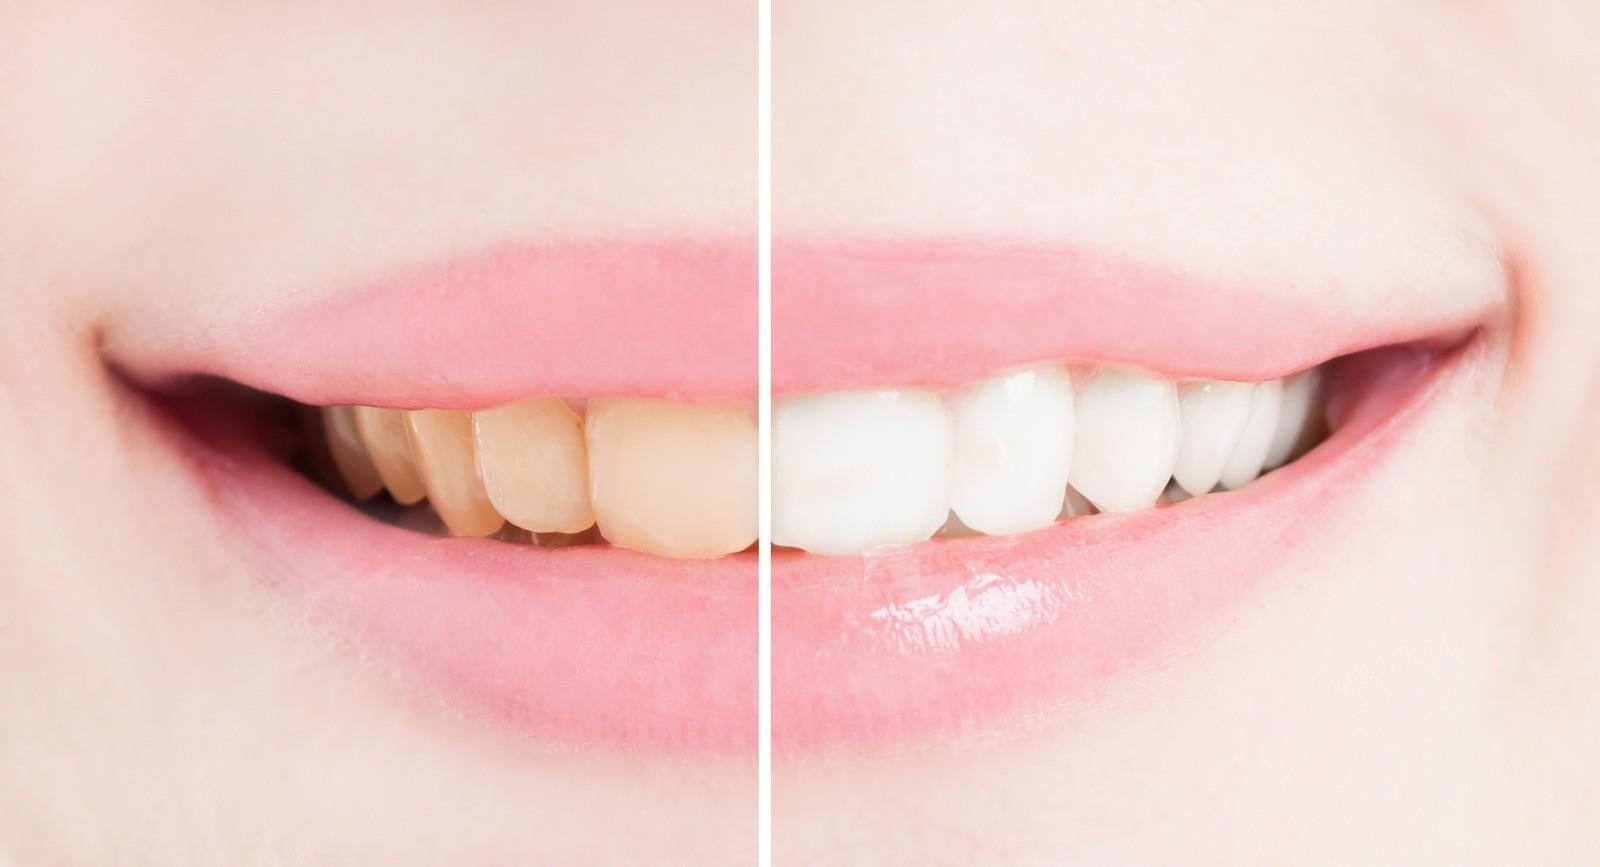 Teeth Whitening Dr. Korwin, Red Bank NJ Middletown NJ Dentist